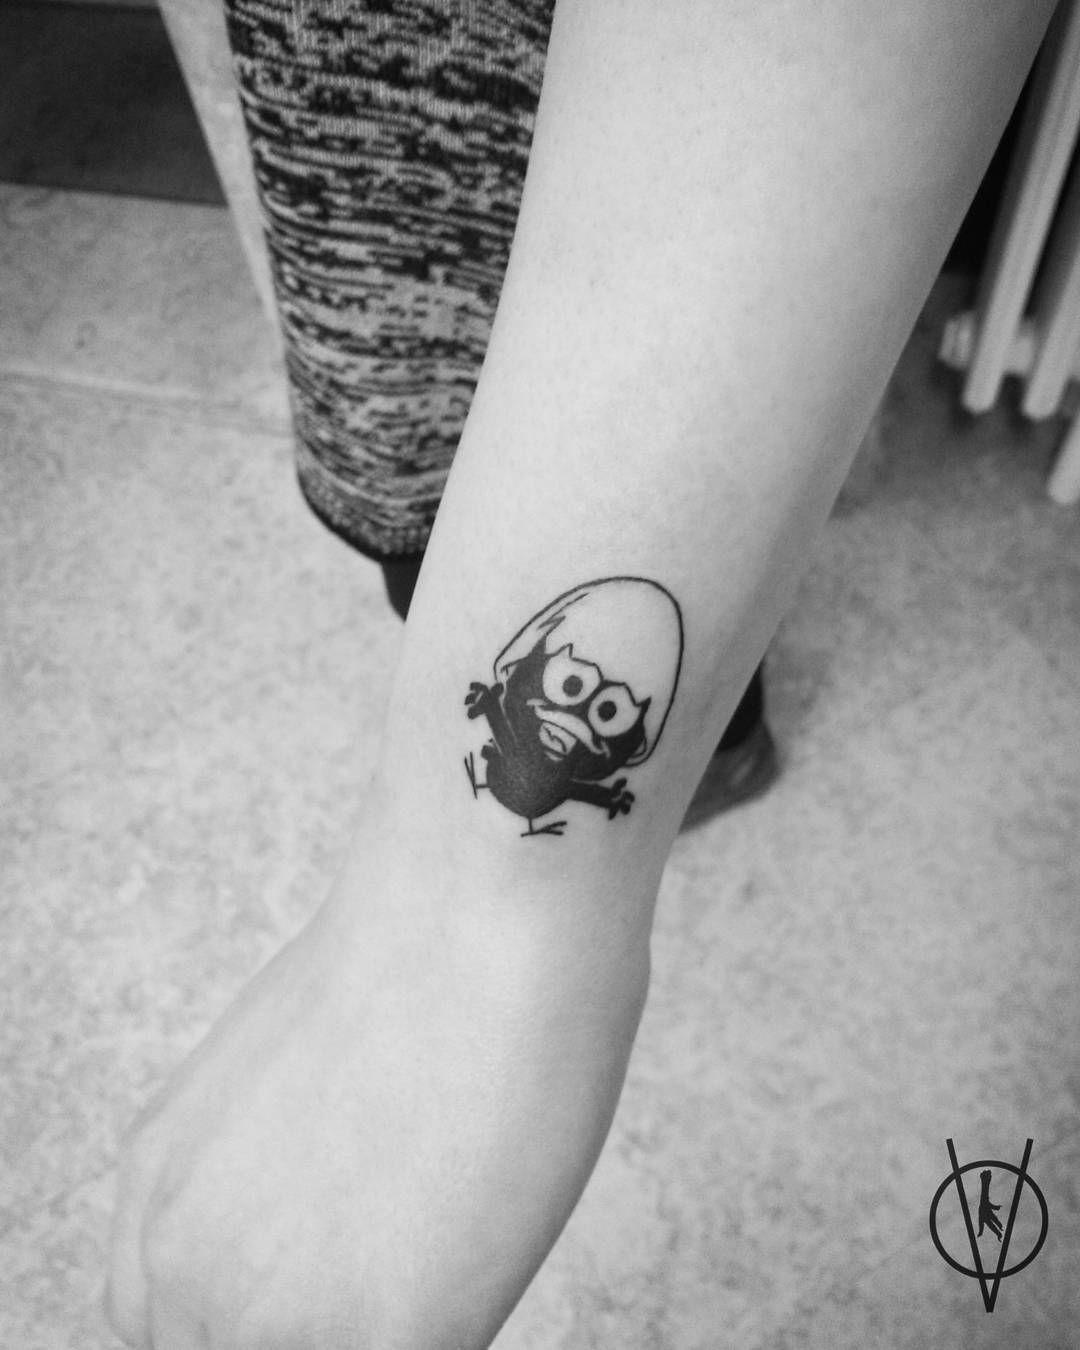 Kalimero :) ····· @tattoospotns ····· #tattoo #tattoos #tattooed #ink #inked #tattooshop #tattooart #drawing #illustration #calimero #btattooing #blackworkerssubmission #blacktattooart #blxckink #inkstinctsubmission #tattooartistmagazine #tattooistartmagazine #tattooistartmag #novisad #custom #customtattoo #cartoon #inkedgirls #girlswithink #tattooedgirls #girlswithtattoos #black #blackandgray